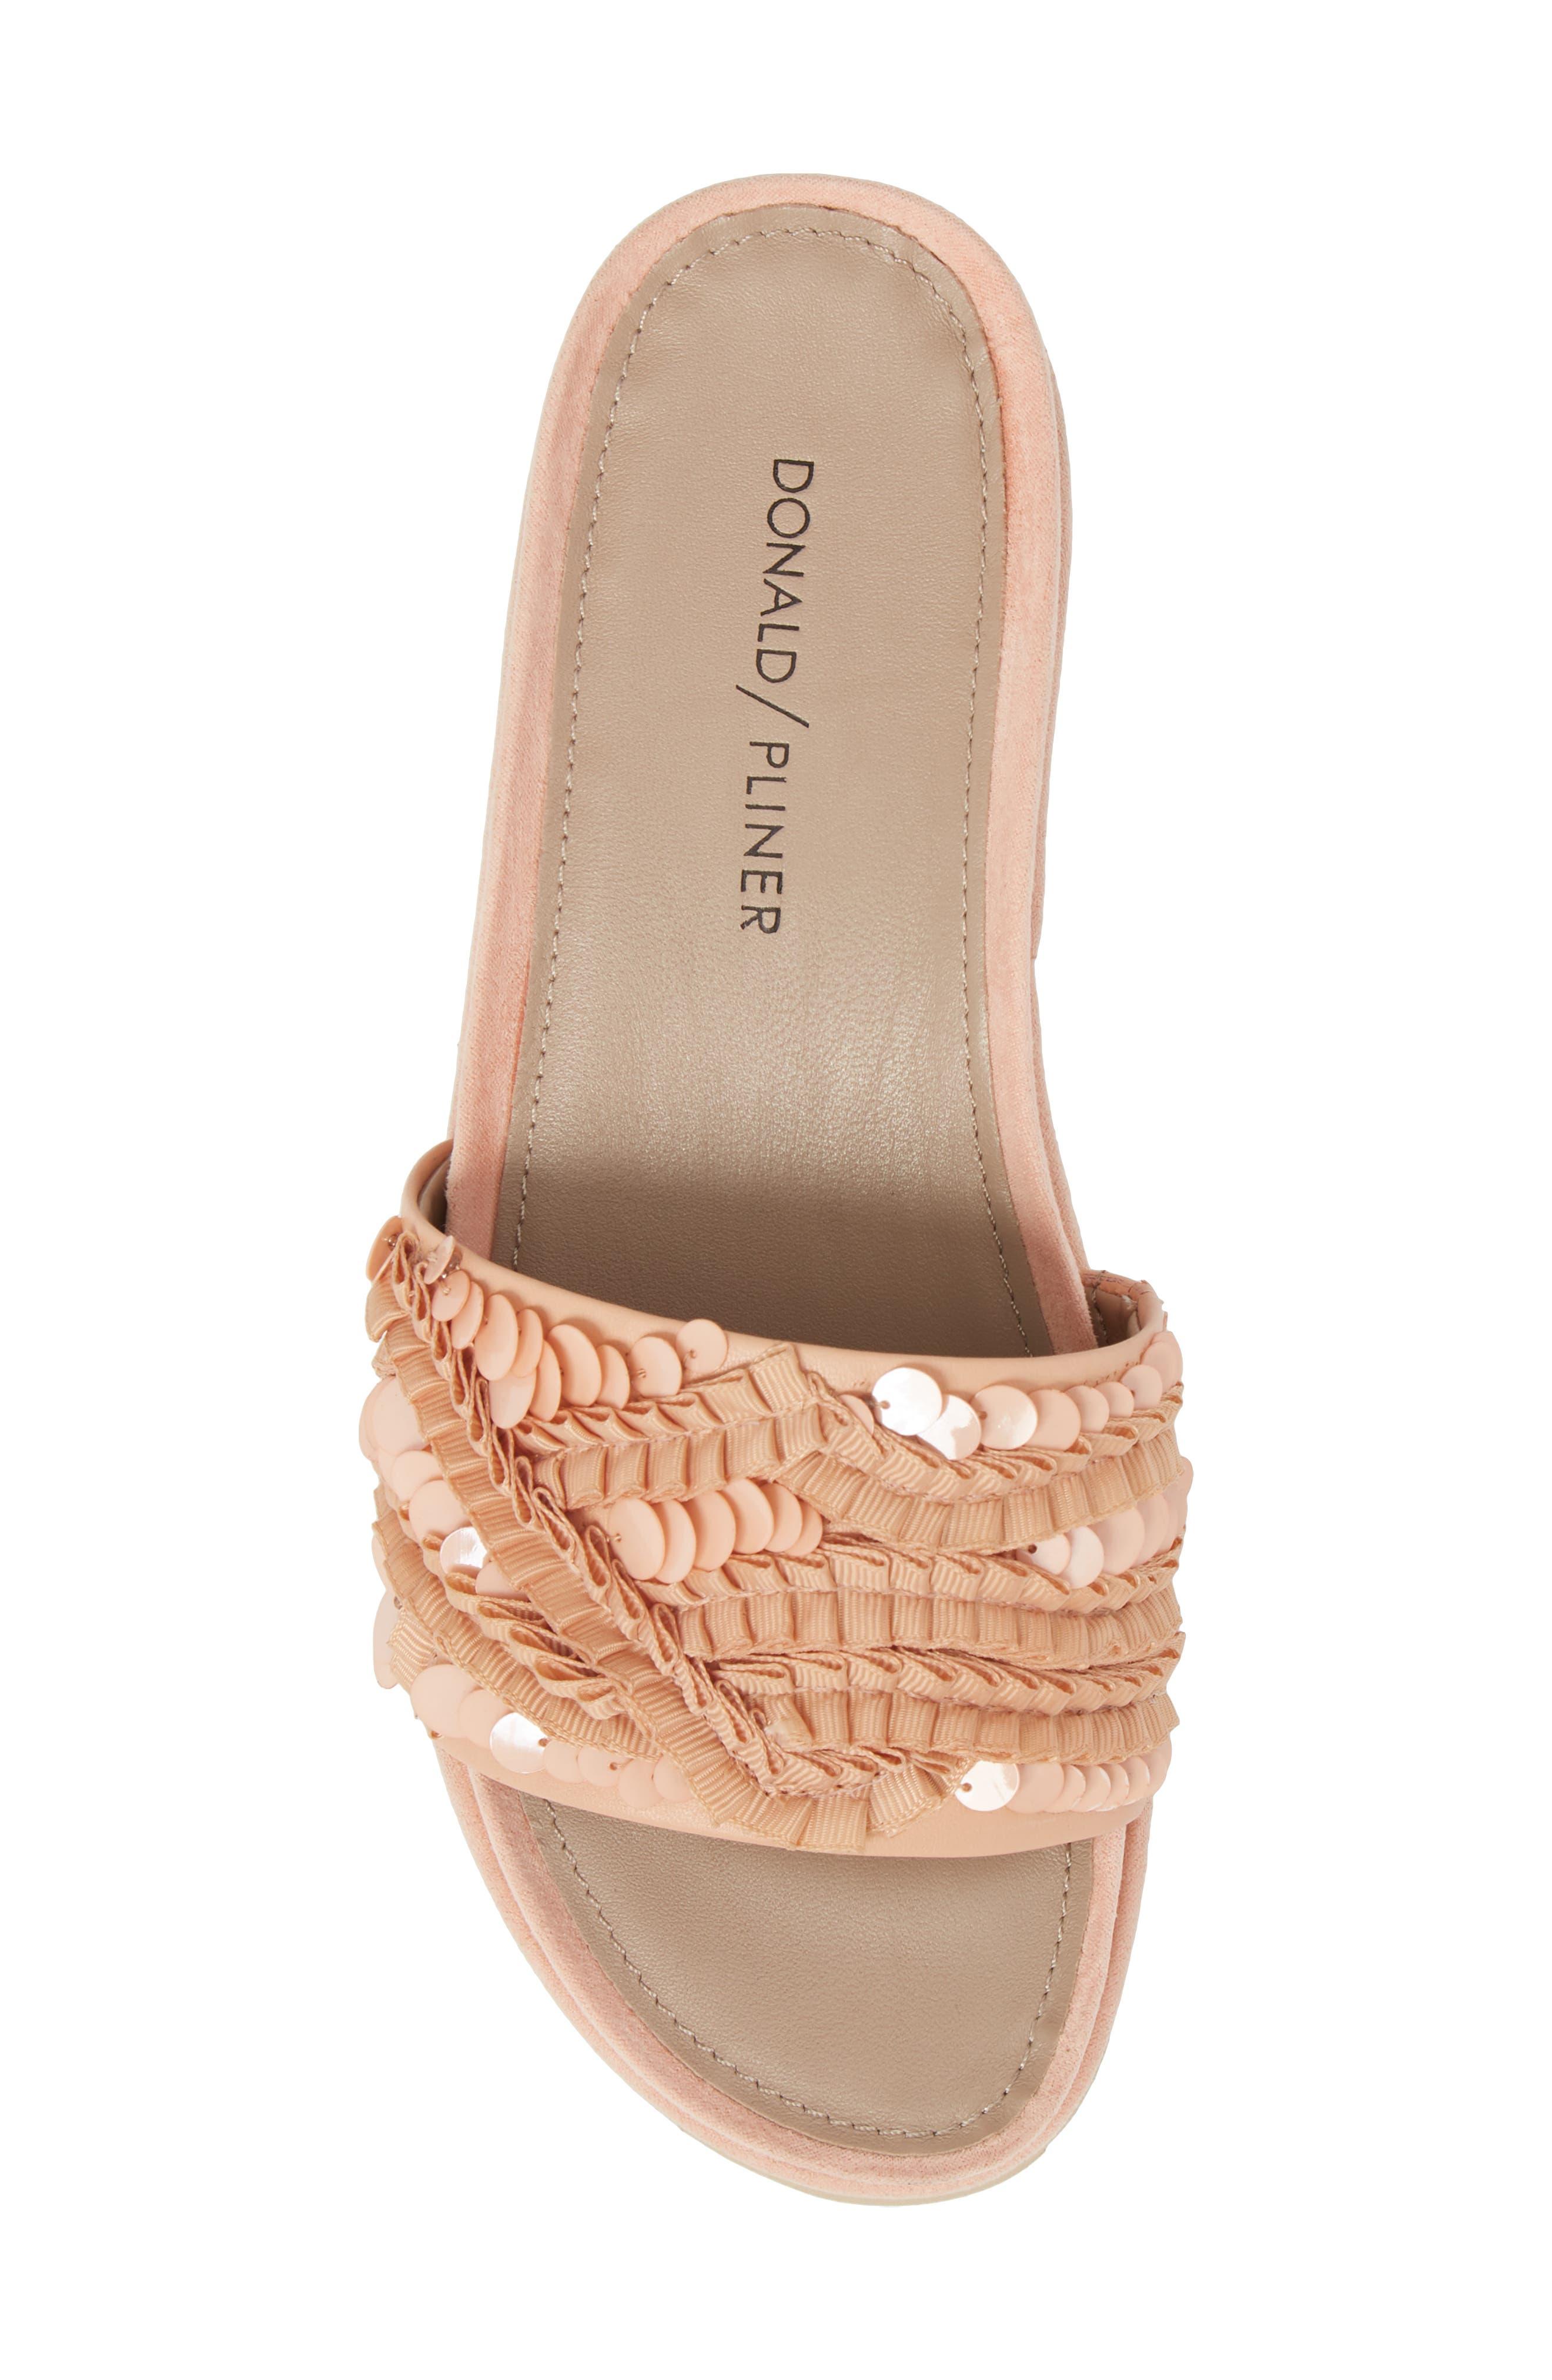 Cava Slide Sandal,                             Alternate thumbnail 4, color,                             Peony Leather